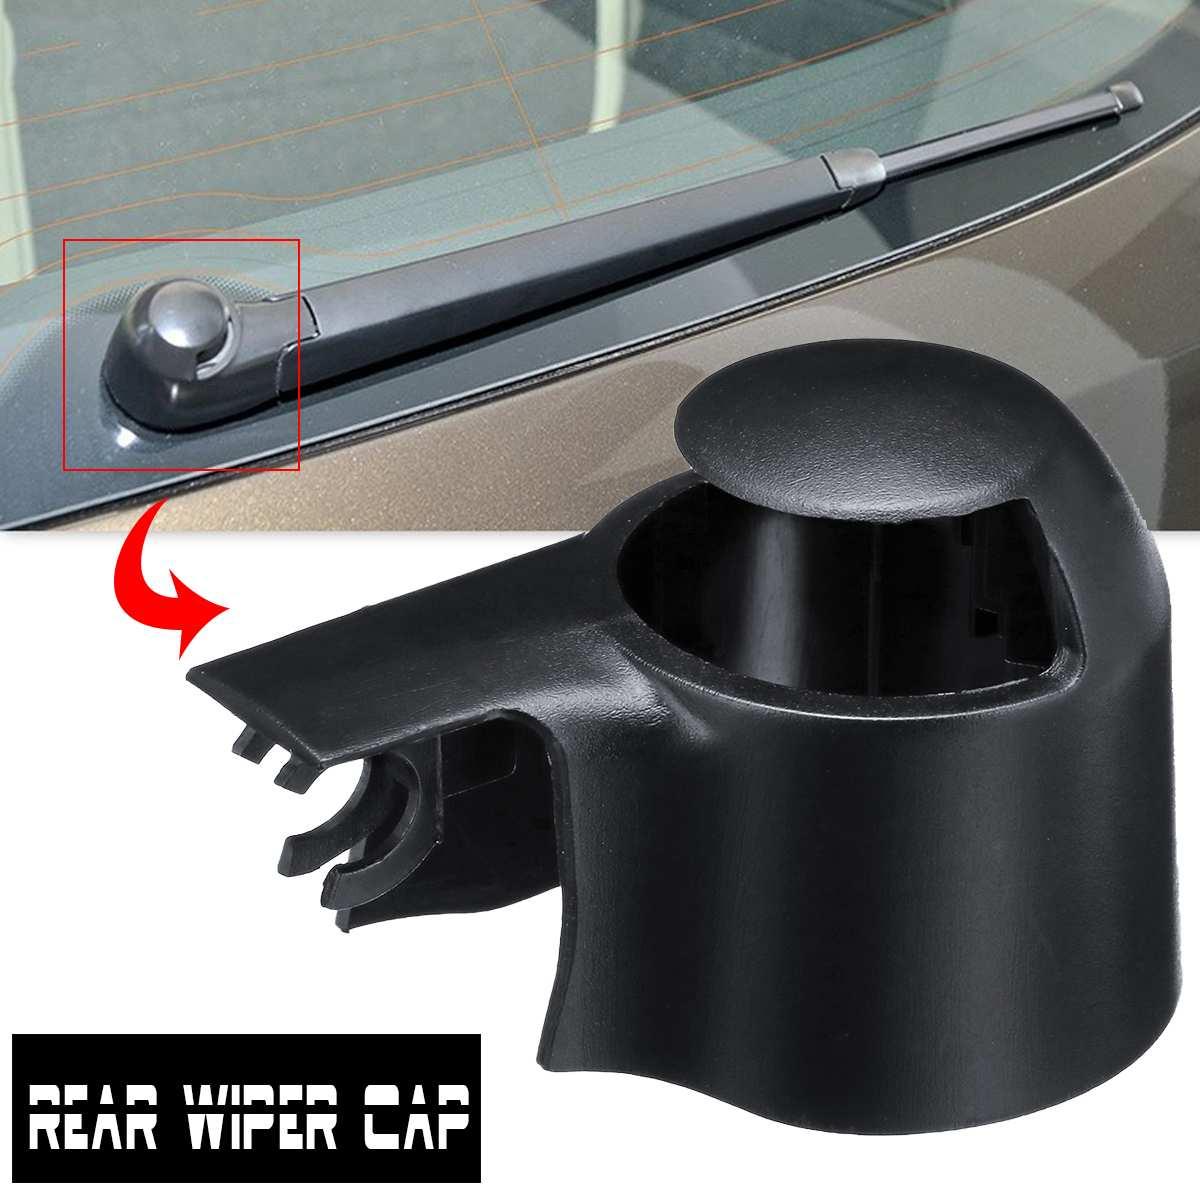 Triumilynn 15276248 for GMC Acadia Saturn Outlook 2007-2012 Rear Window Wiper Arm Blade Set